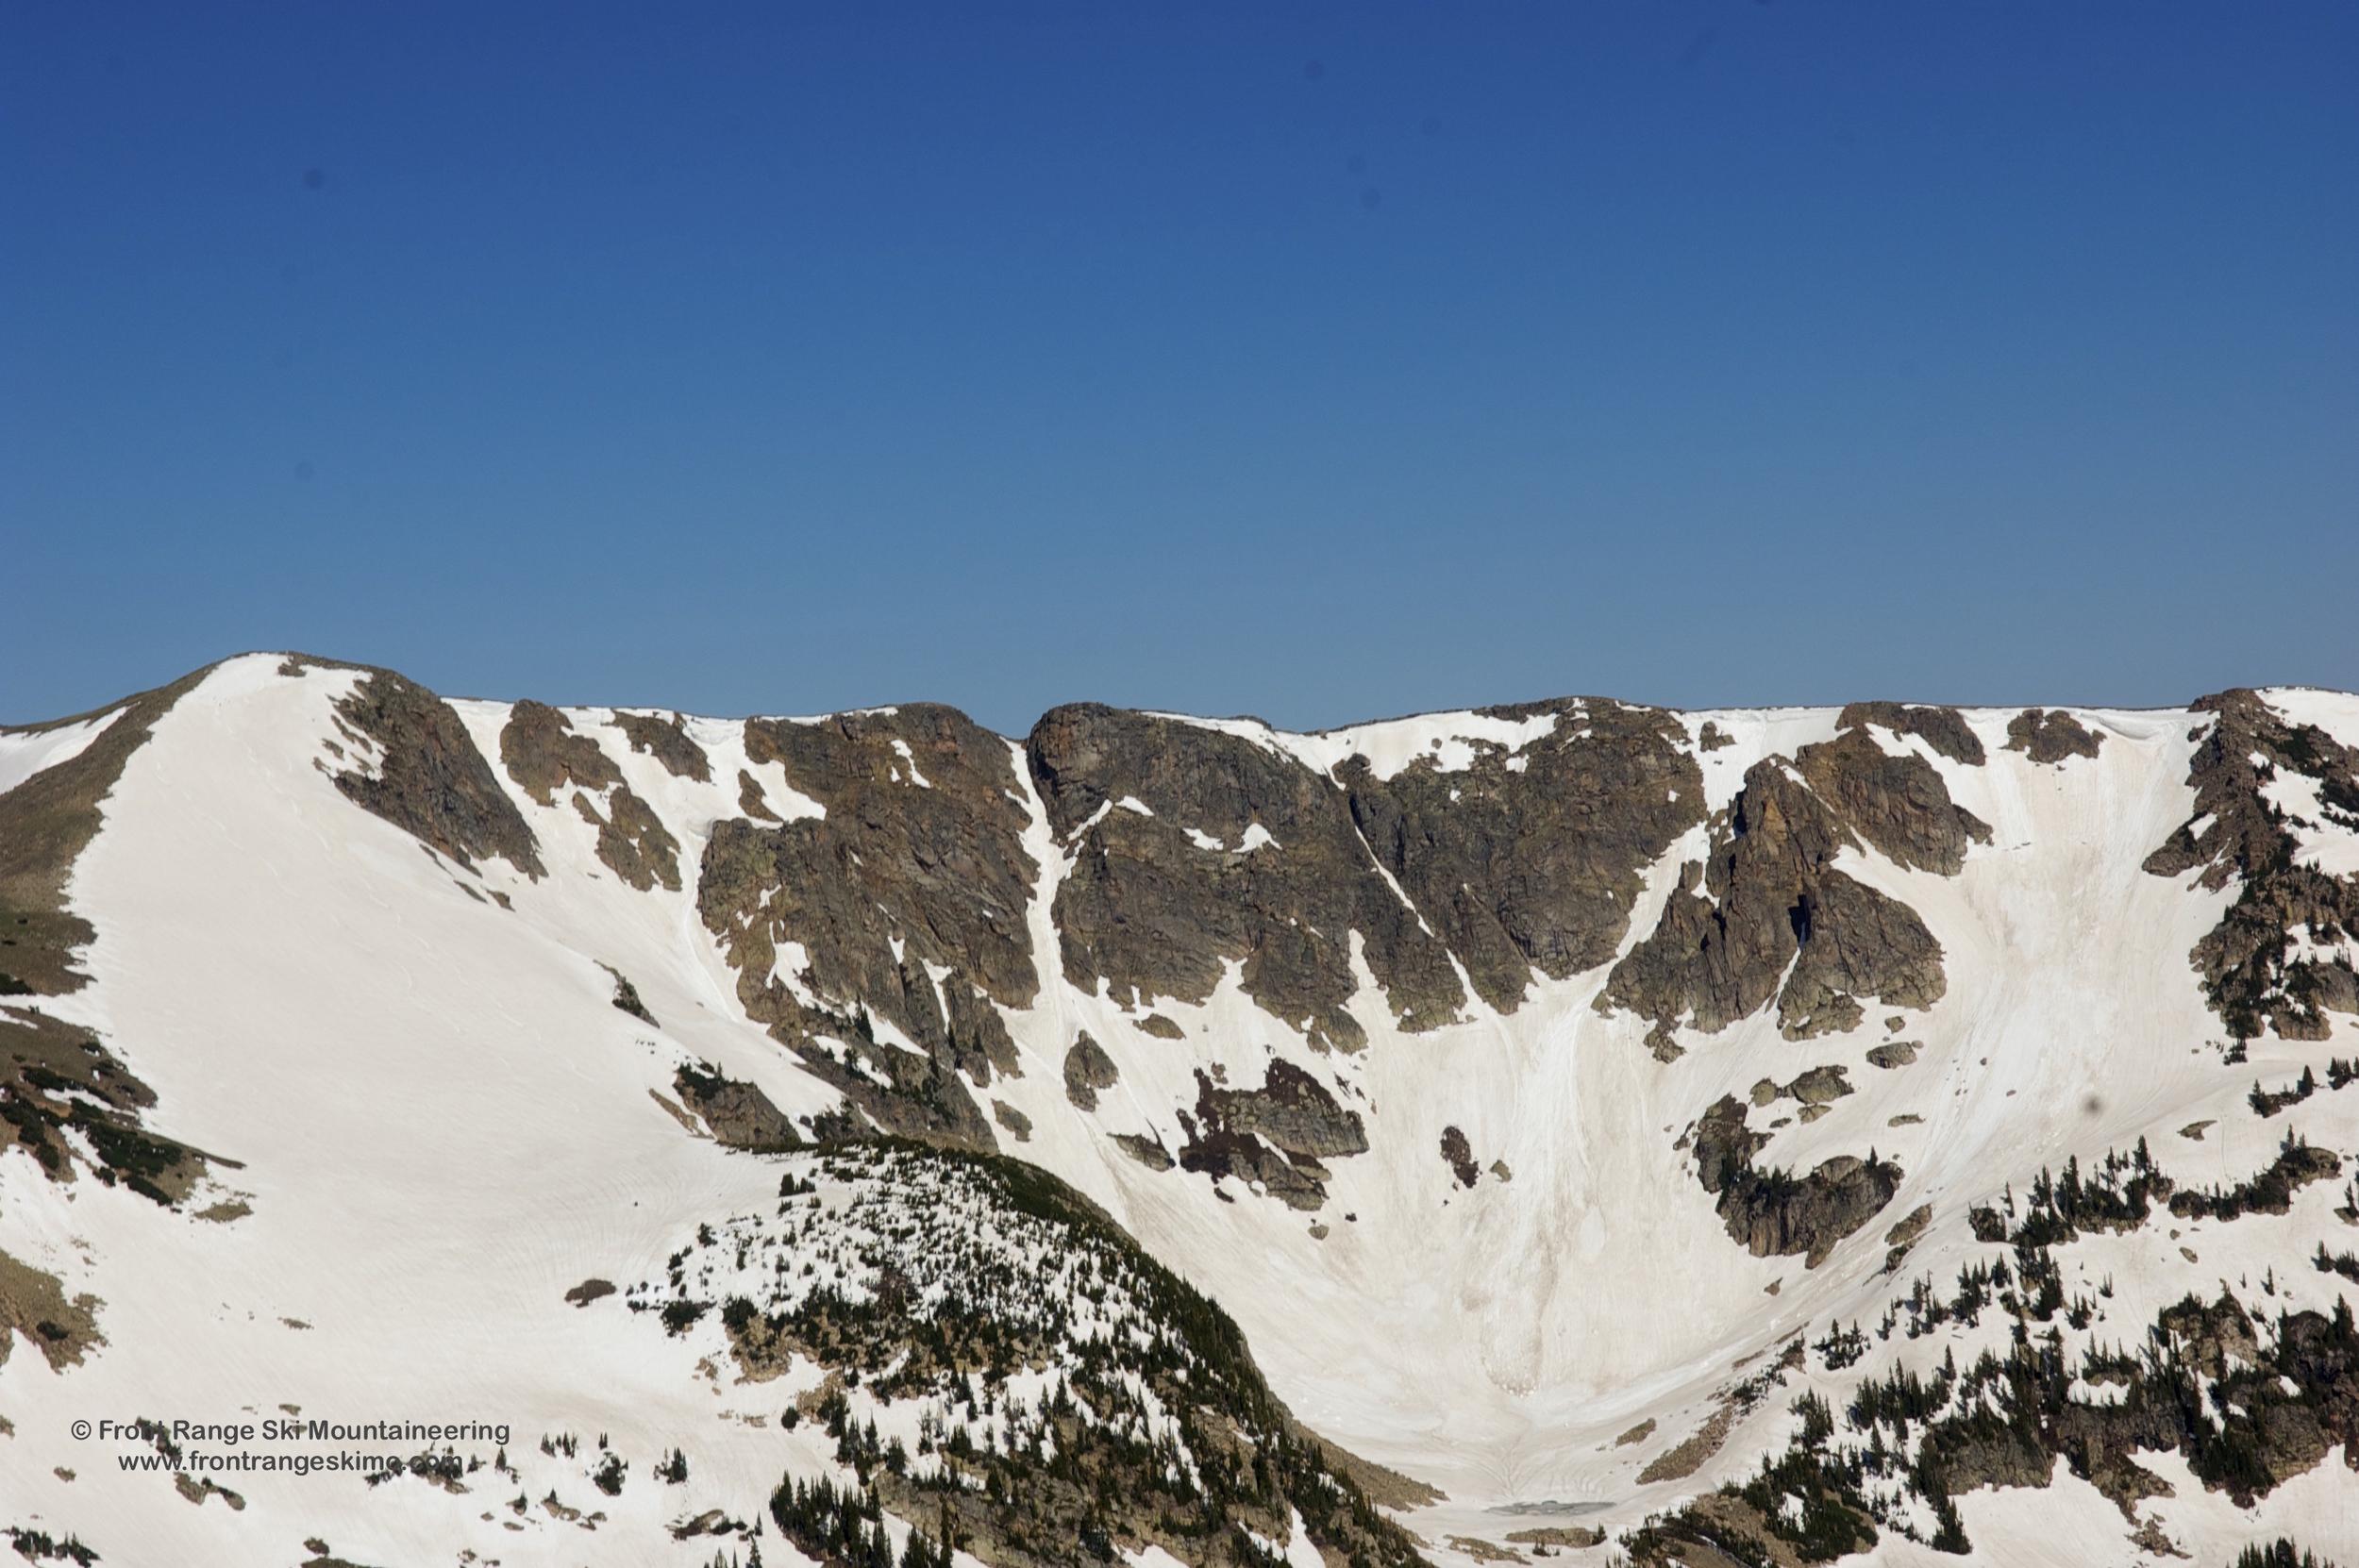 Radiobeacon Peak from the East.